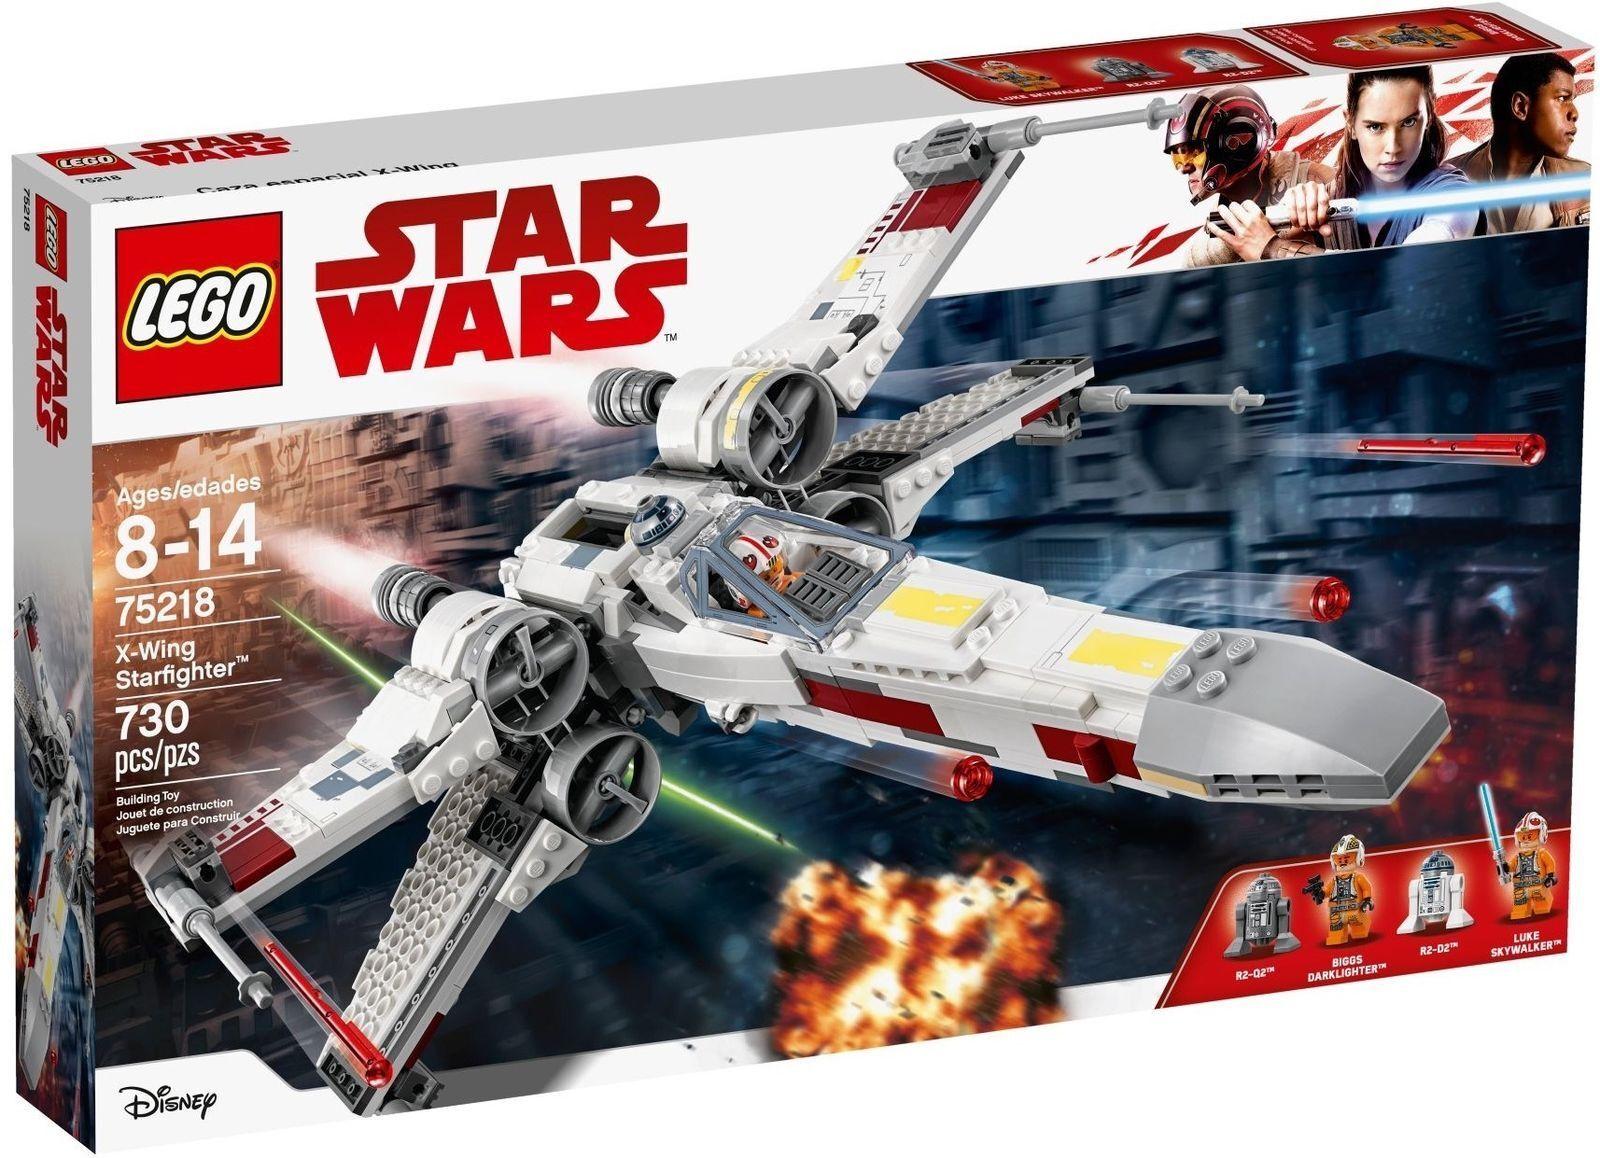 LEGO STAR WARS 75218  X-WING STARFIGHTER   NUOVO